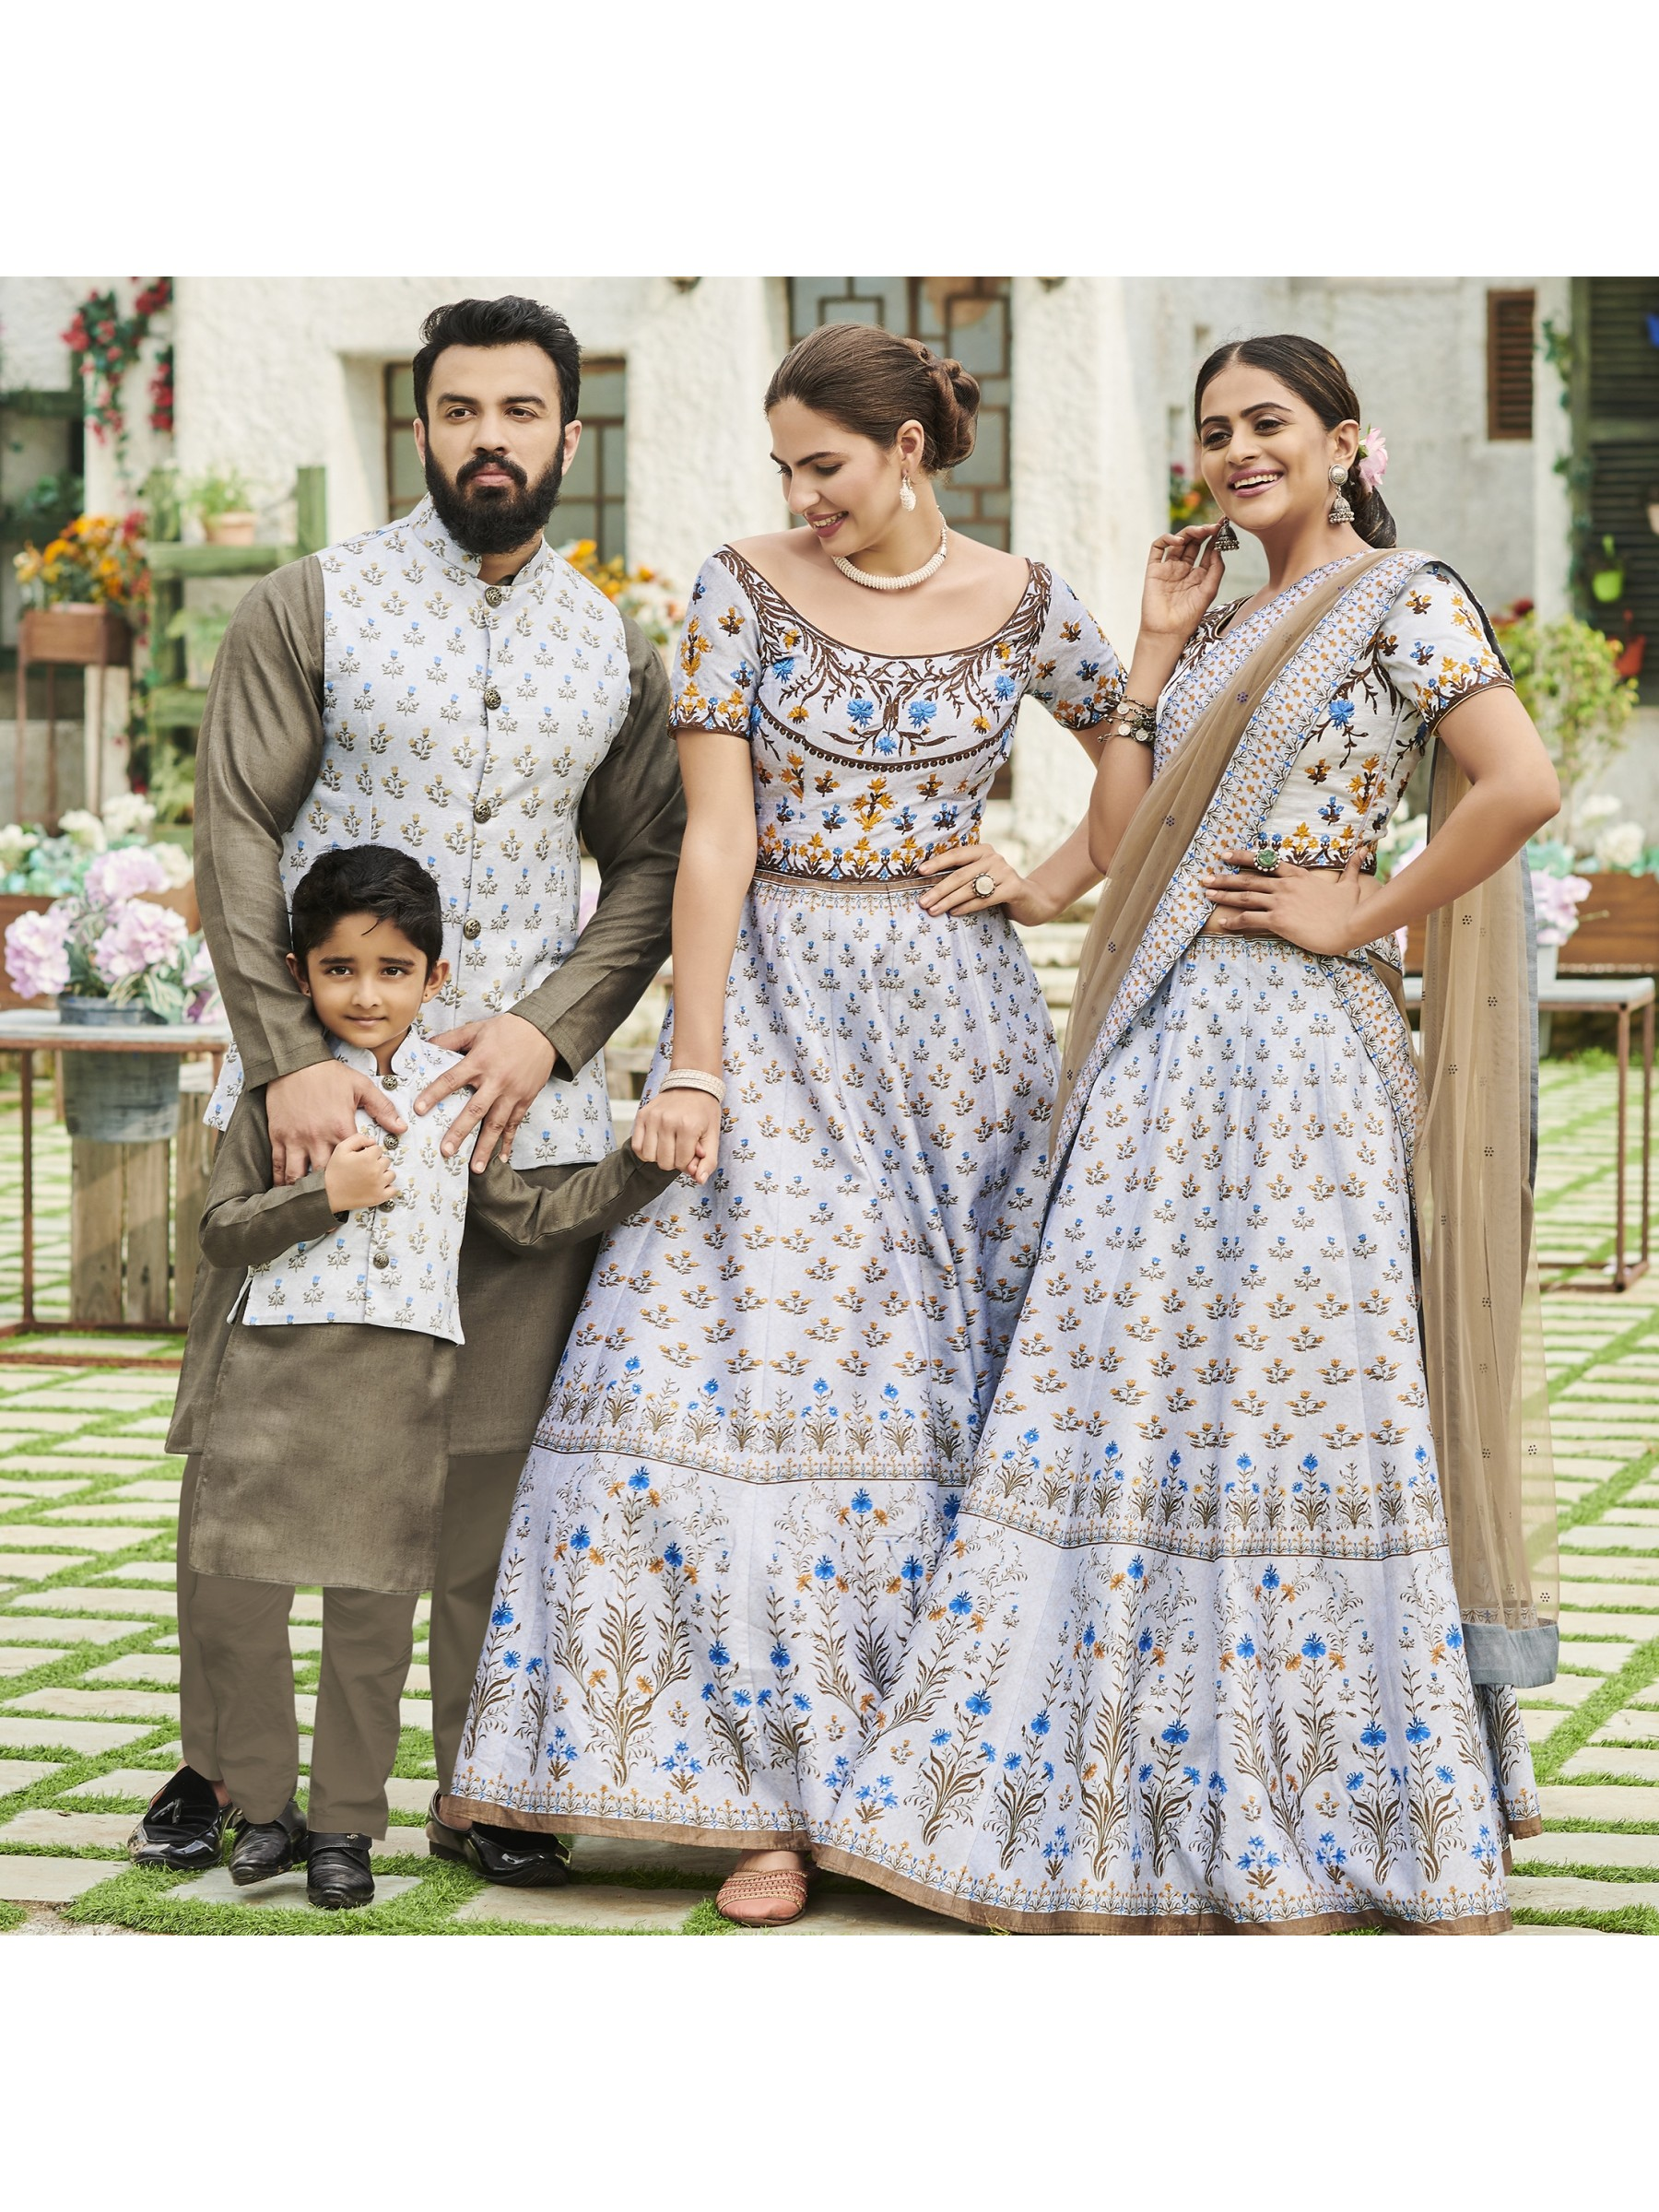 Pure Heritage Silk Wedding Wear Full Family Combo in Light Grey color Digital Print Work & Stone Work